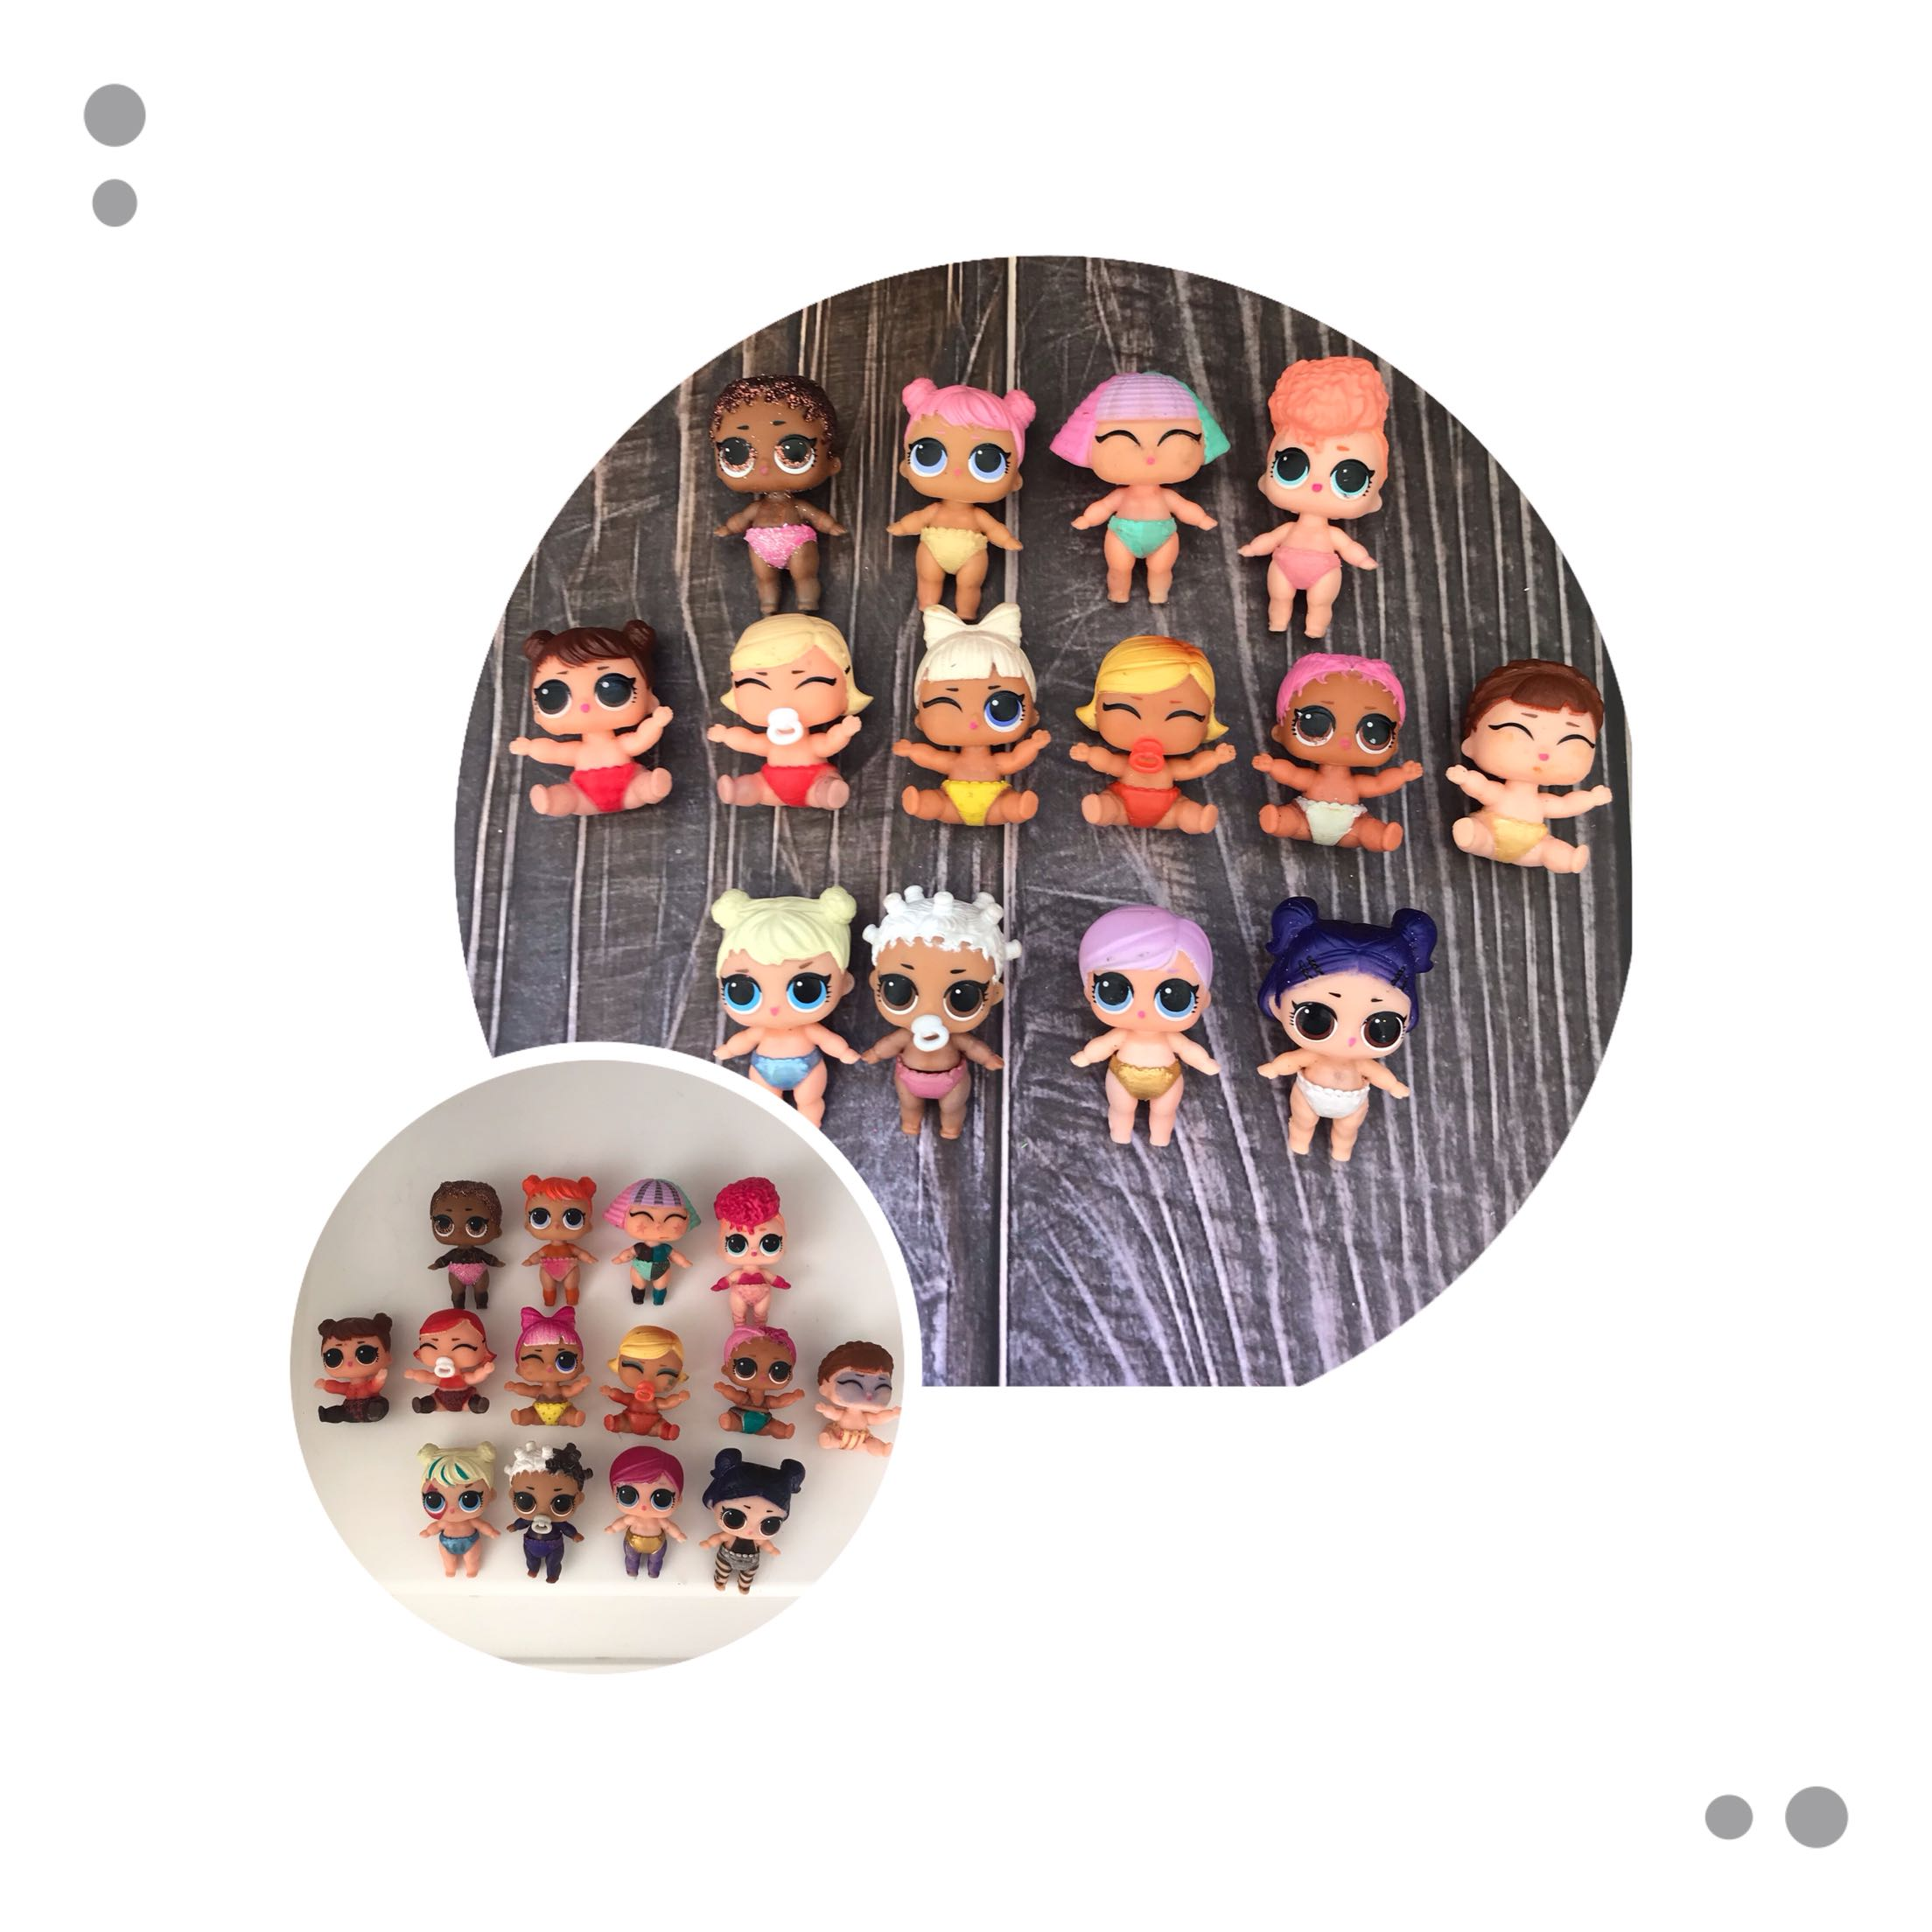 LOL Doll Surprise Original Cute Mini Surprise Little Sister Cold Discoloration Children's Toys Dolls Girl Gift